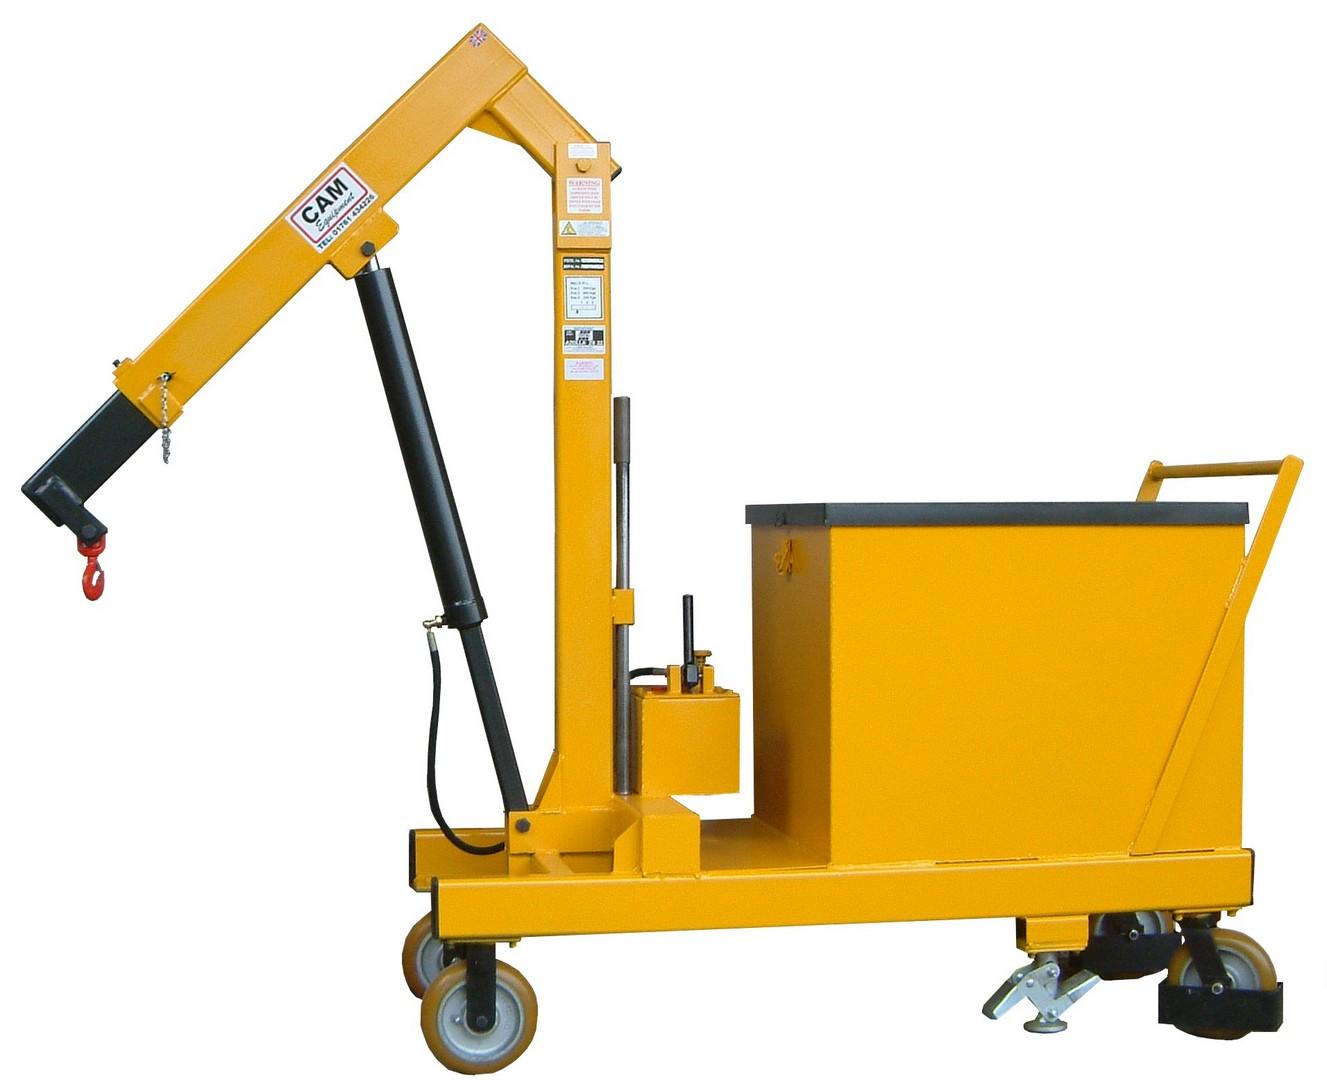 1T Counterbalance Floor Crane